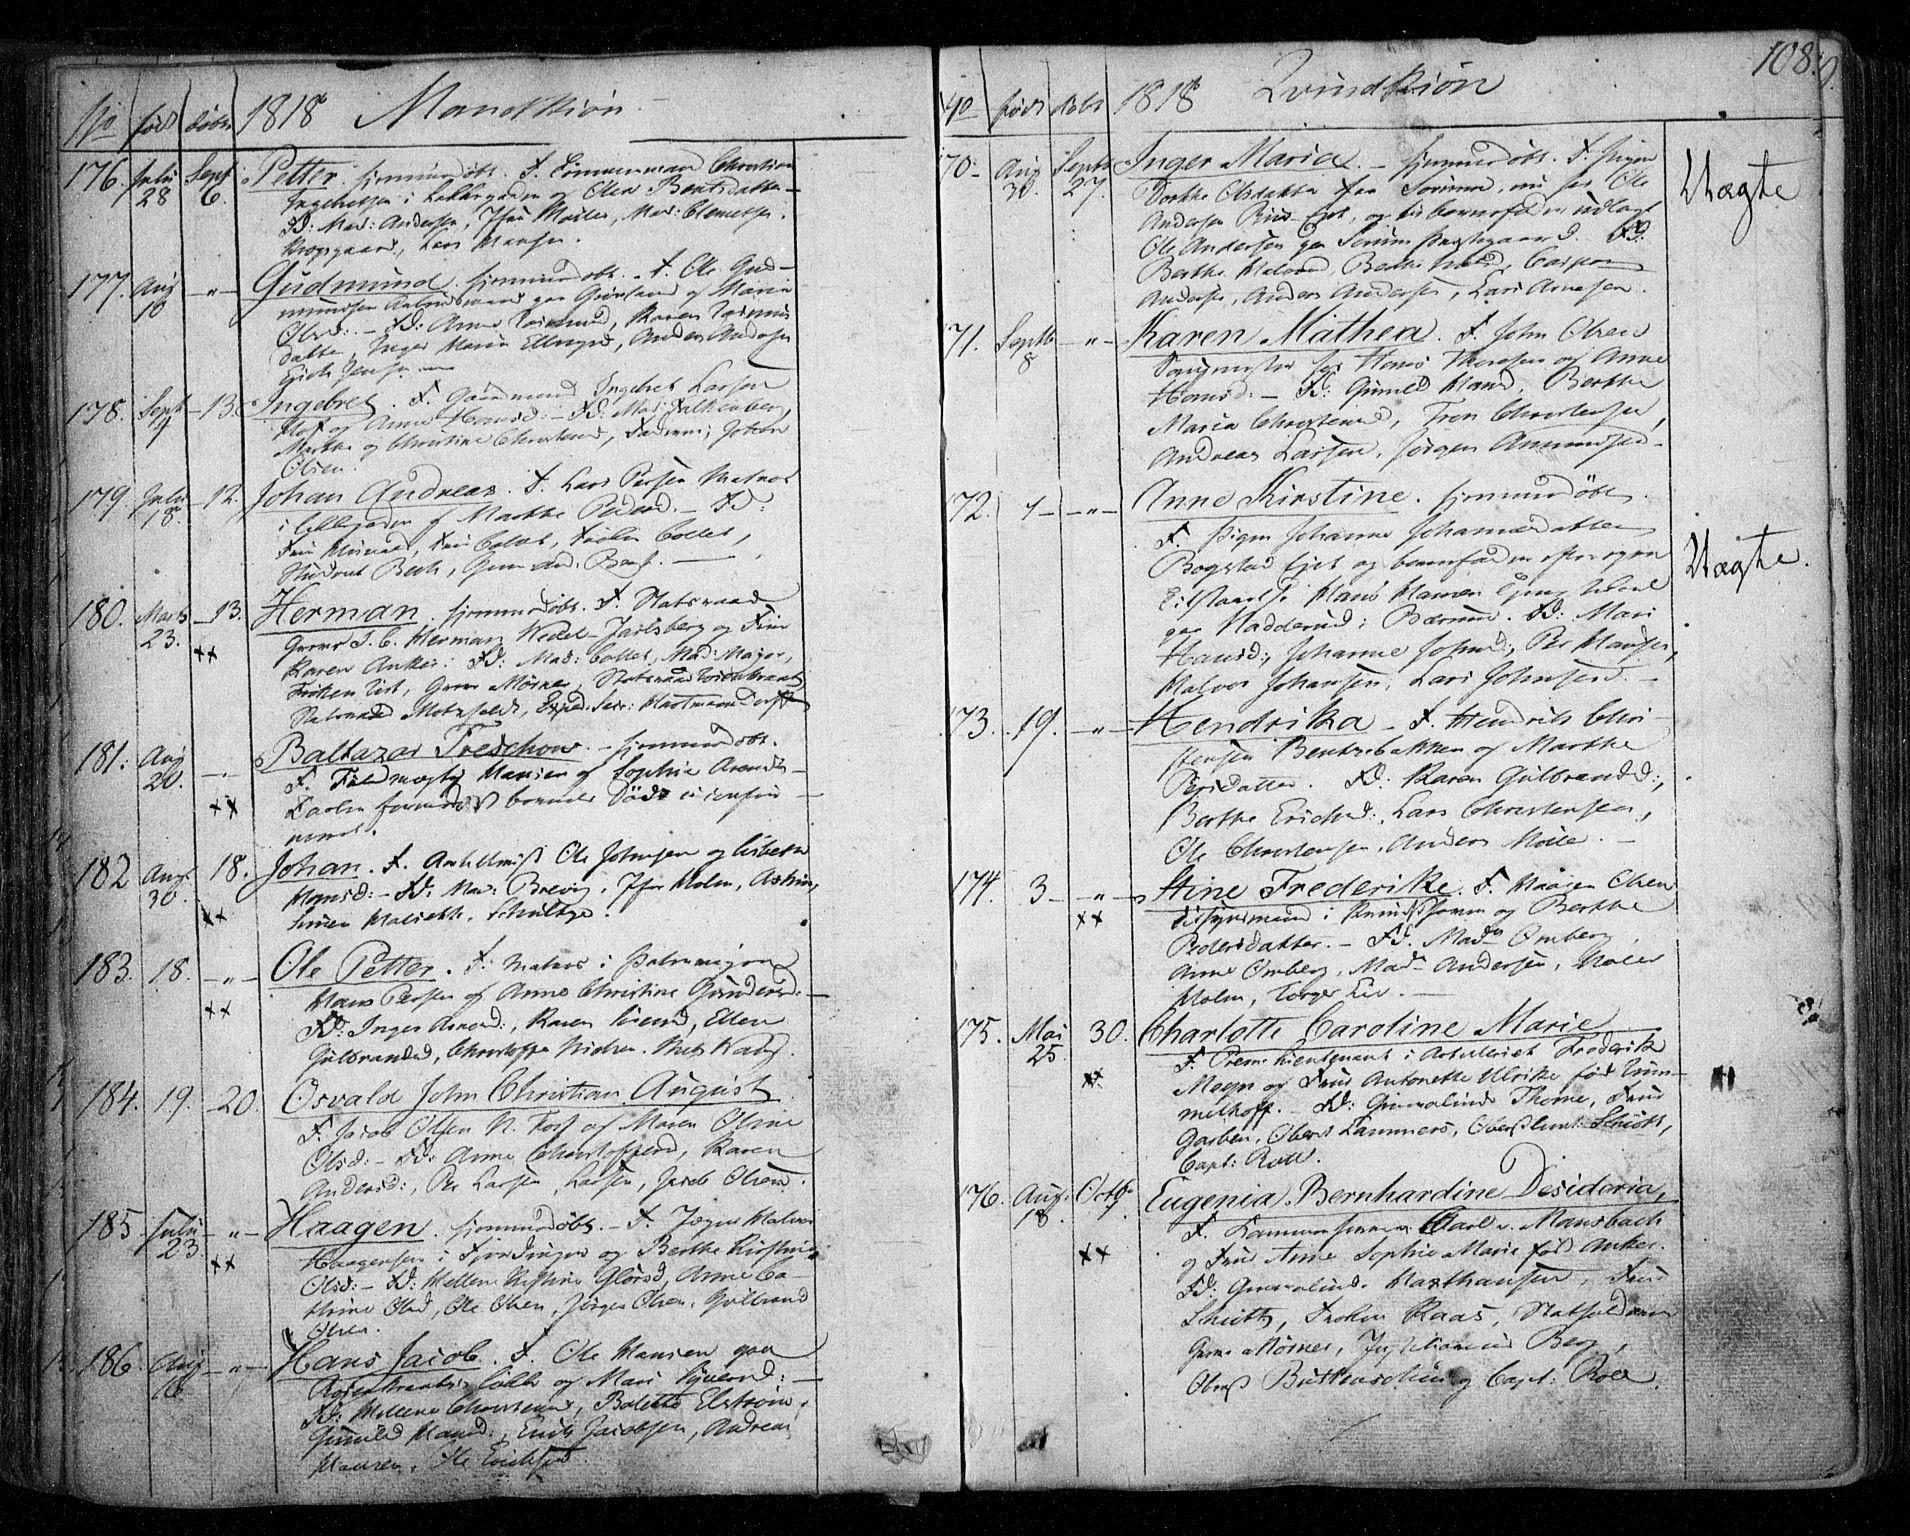 SAO, Aker prestekontor kirkebøker, F/L0011: Parish register (official) no. 11, 1810-1819, p. 108